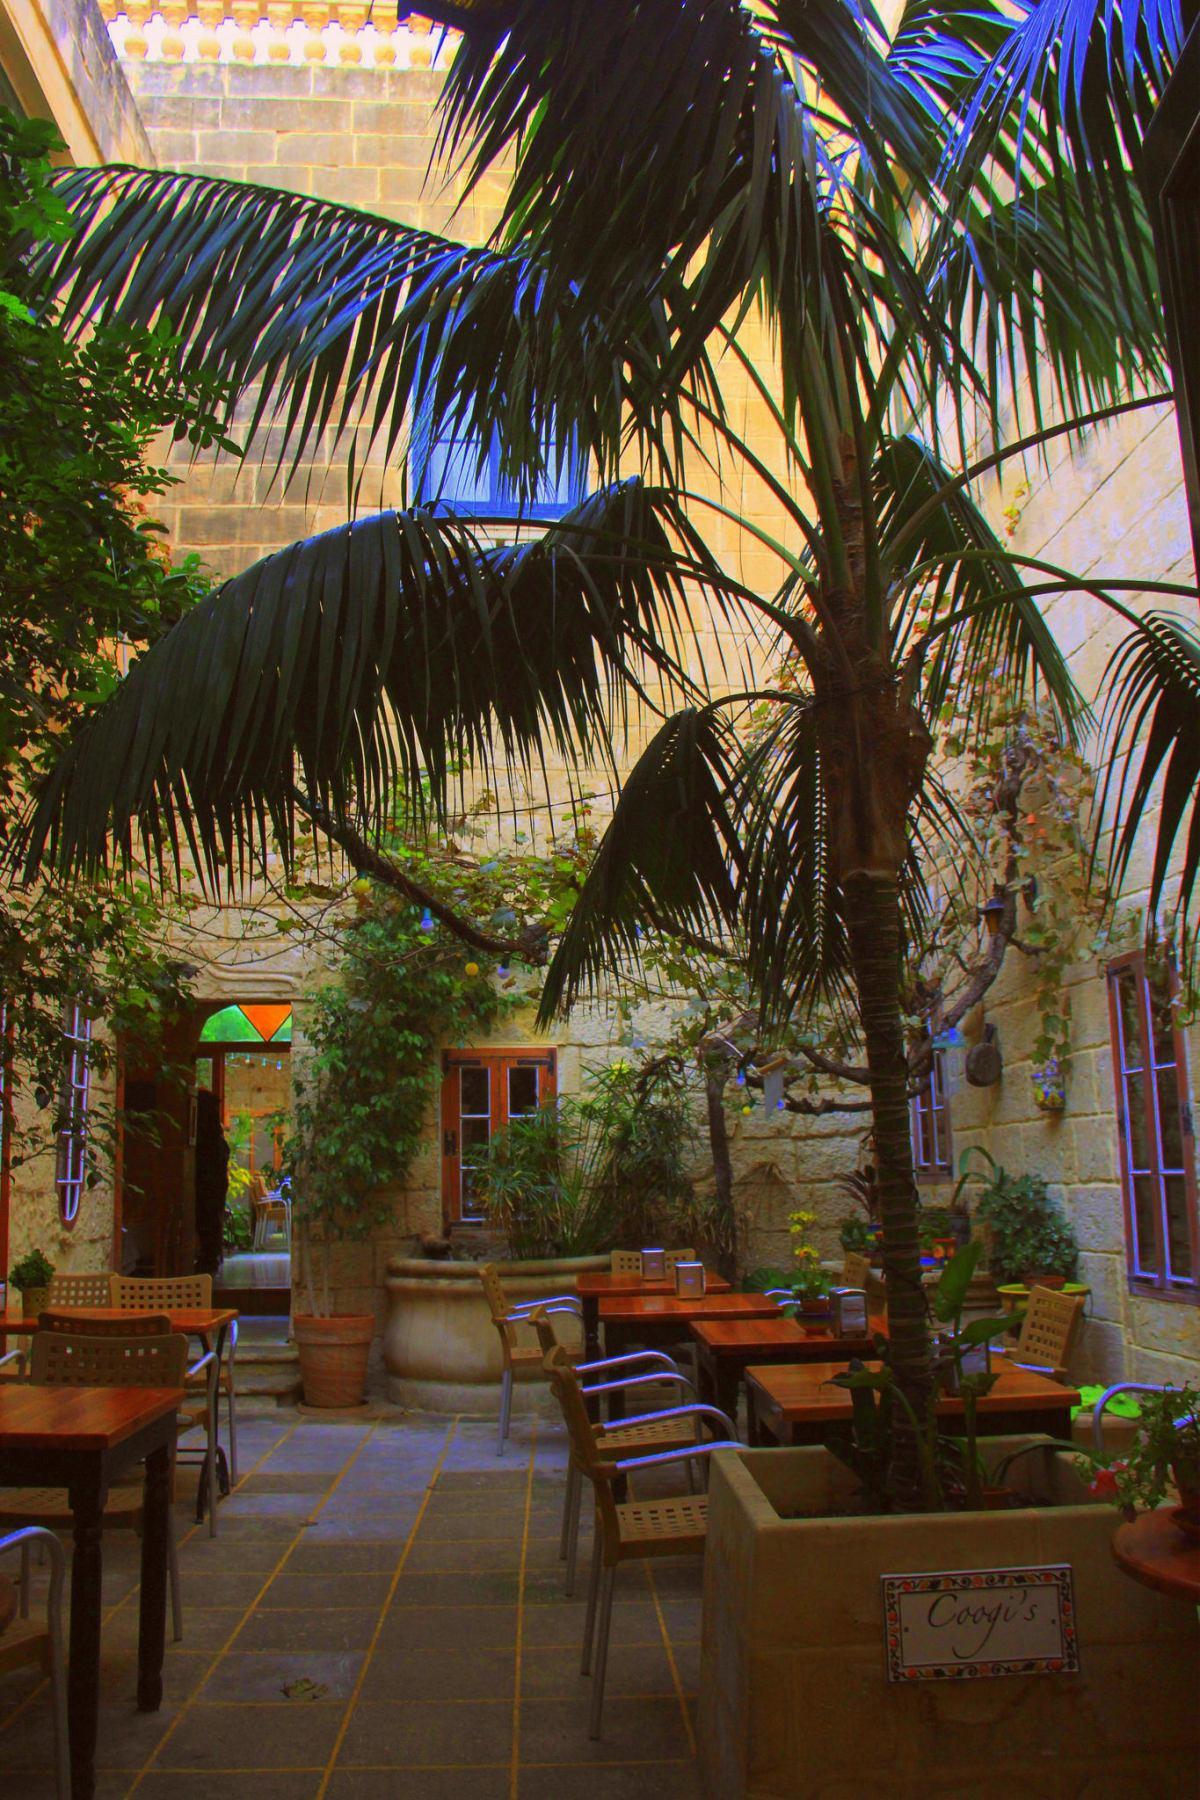 Beautiful Malta is a great European destination